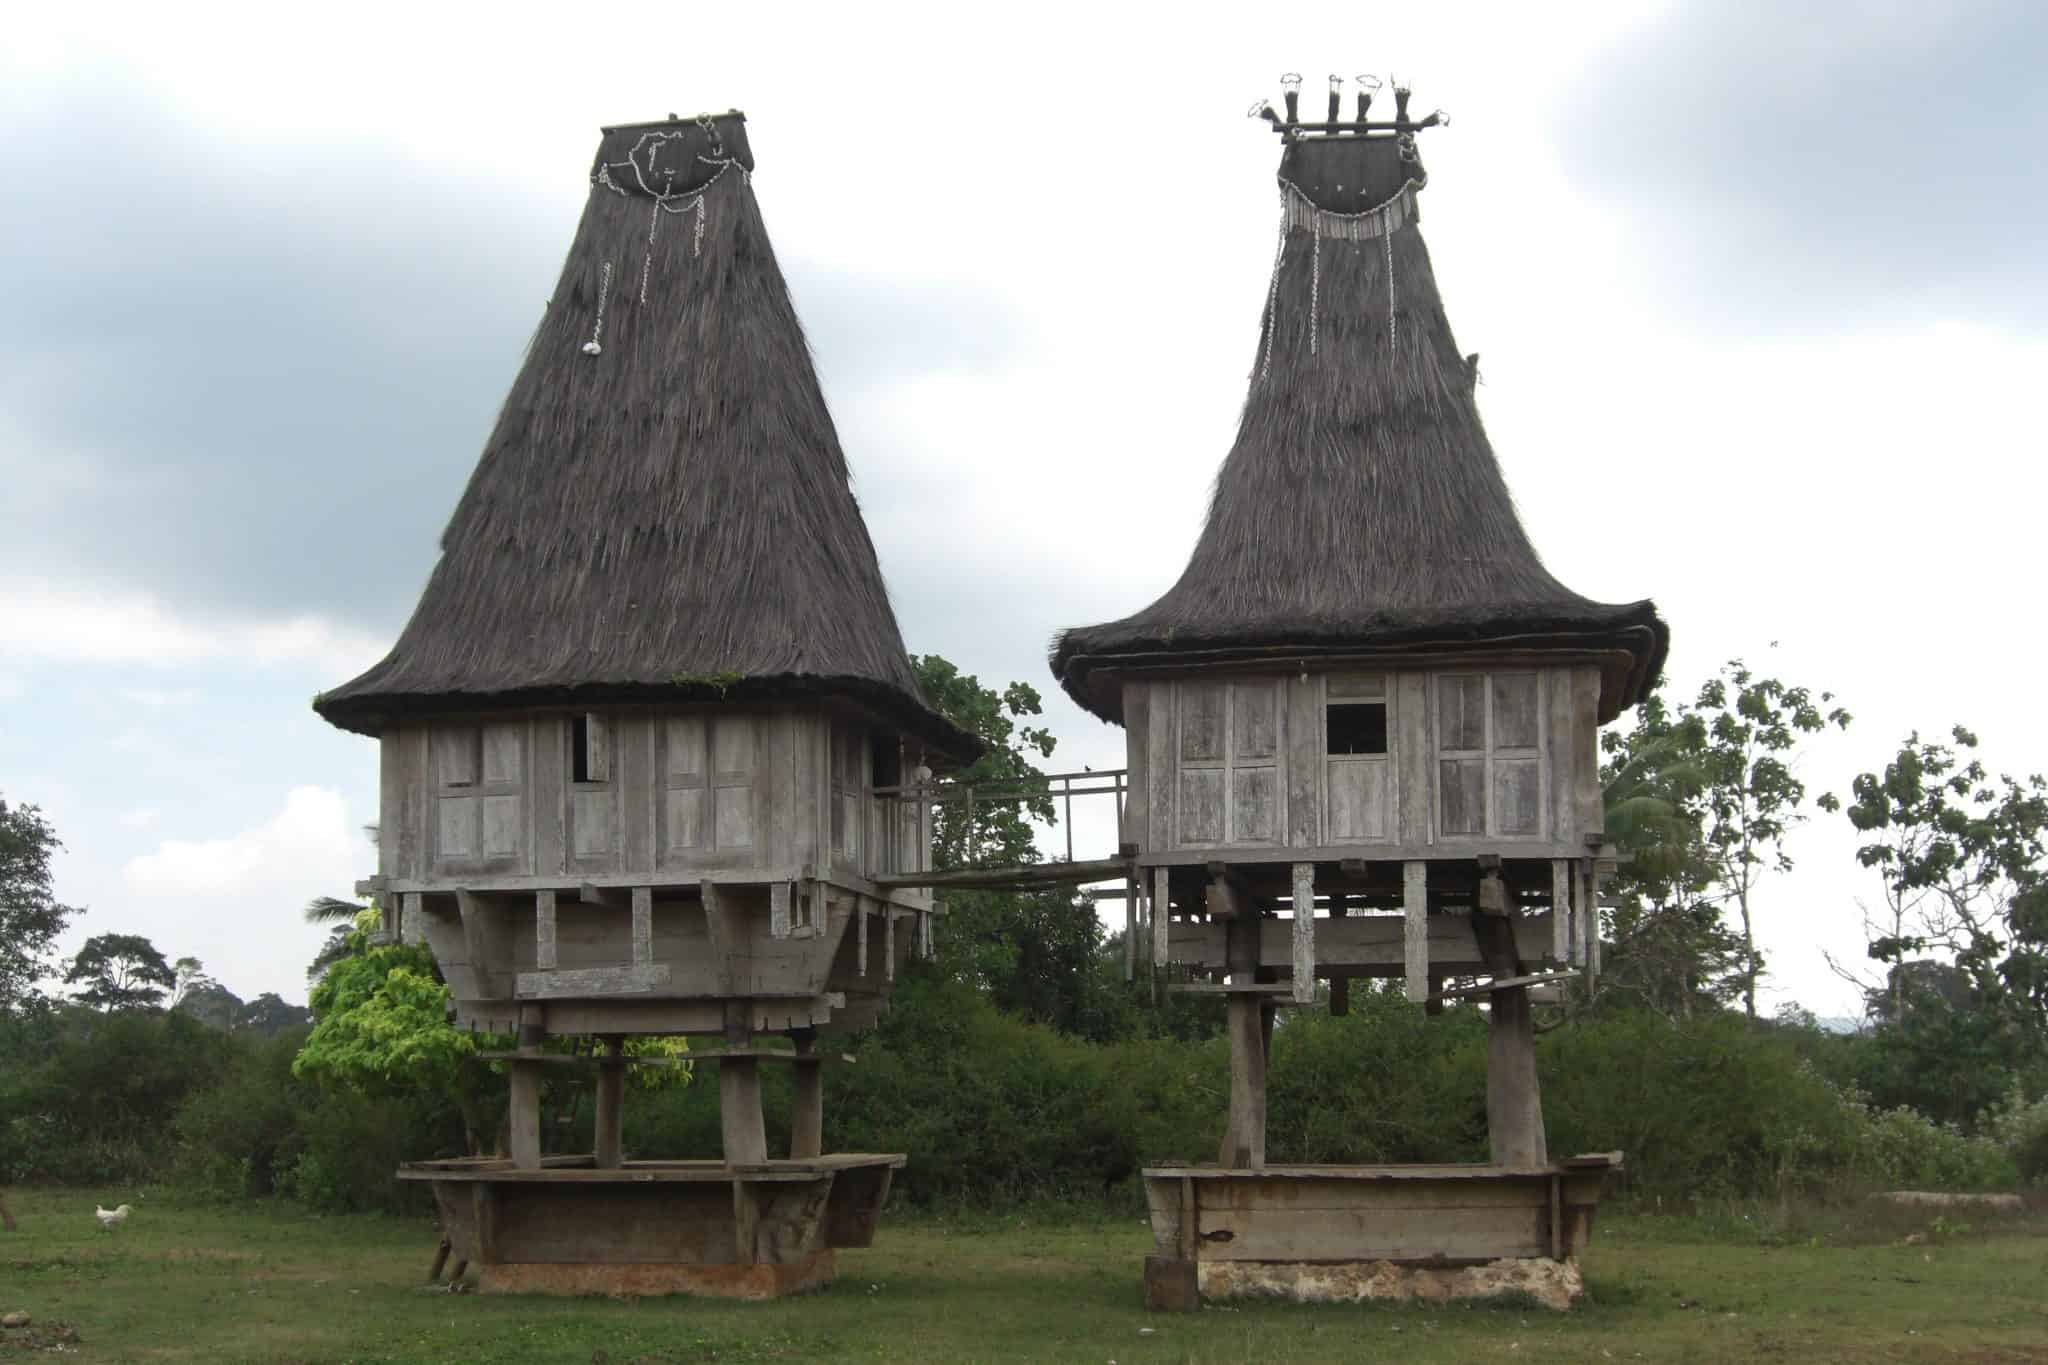 Casas t°picas de Timor-Leste